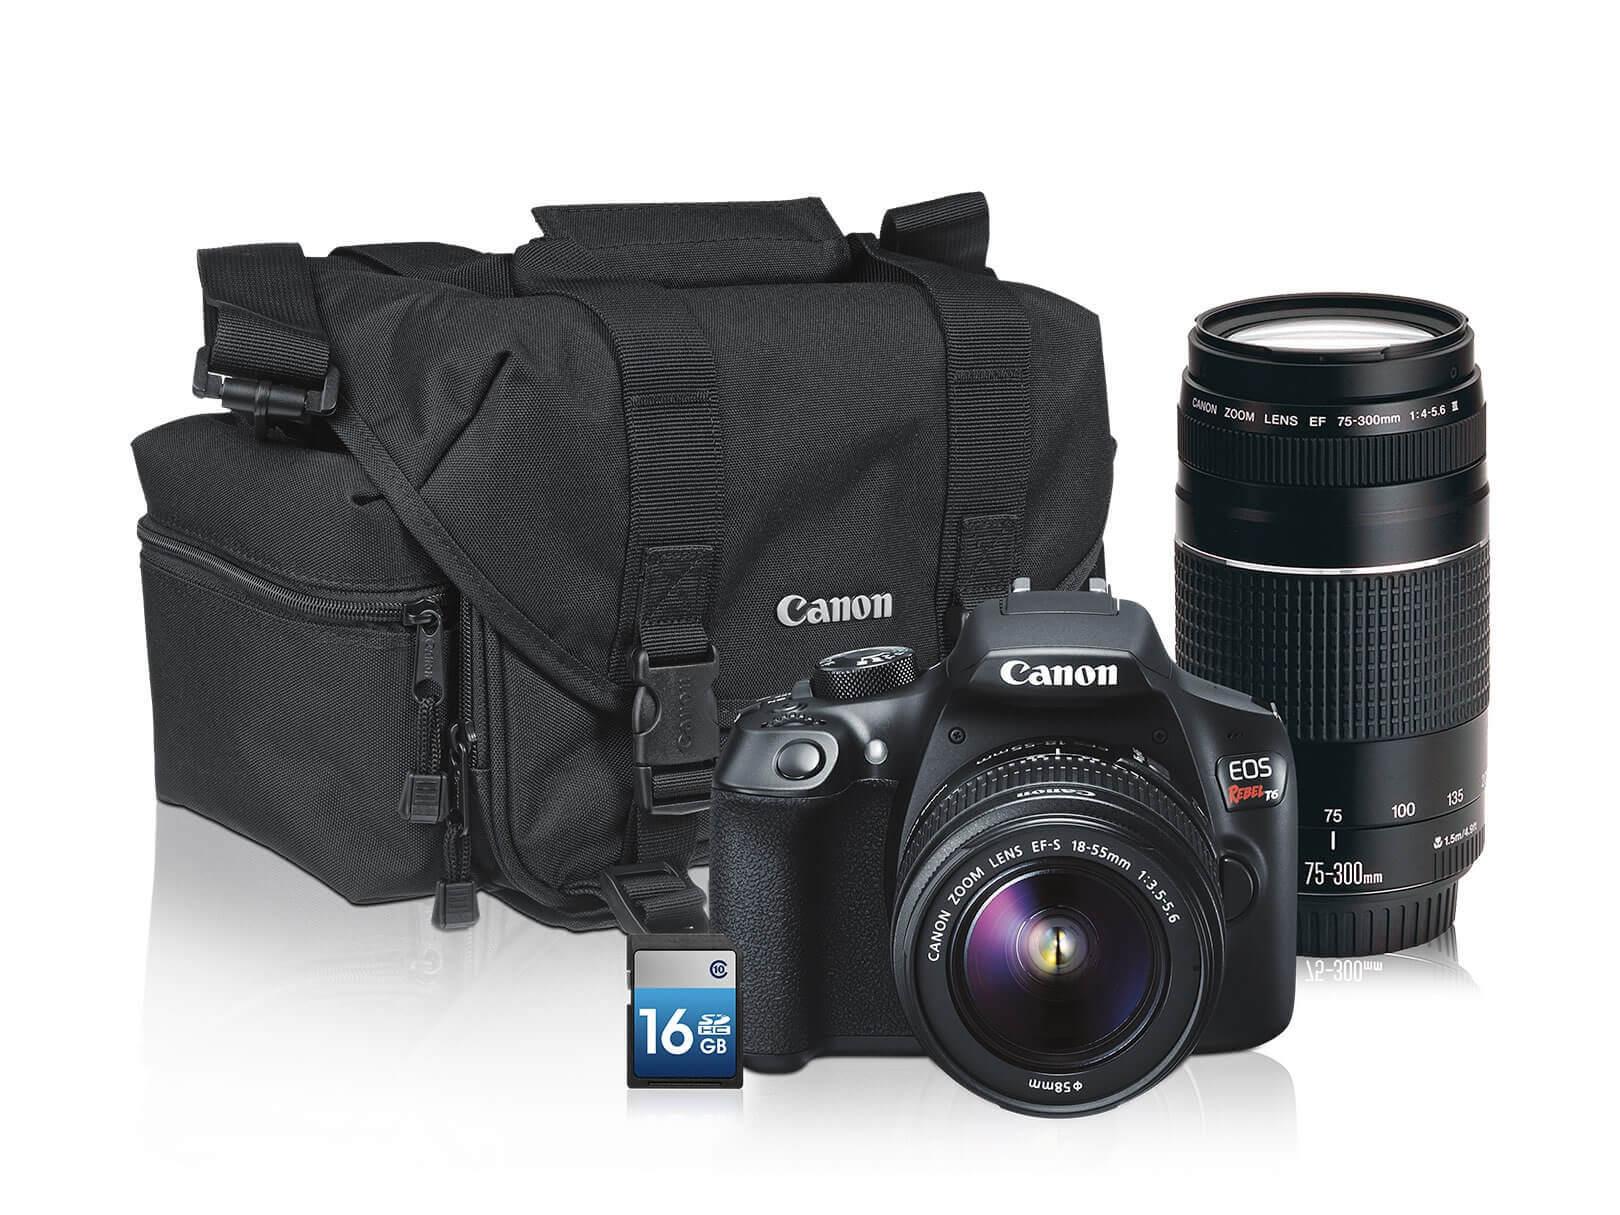 Best Buy: Canon Kit Cámara DSLR T6 con Lente 18-55mm más 75-300mm   Estuche   16GB – Negro